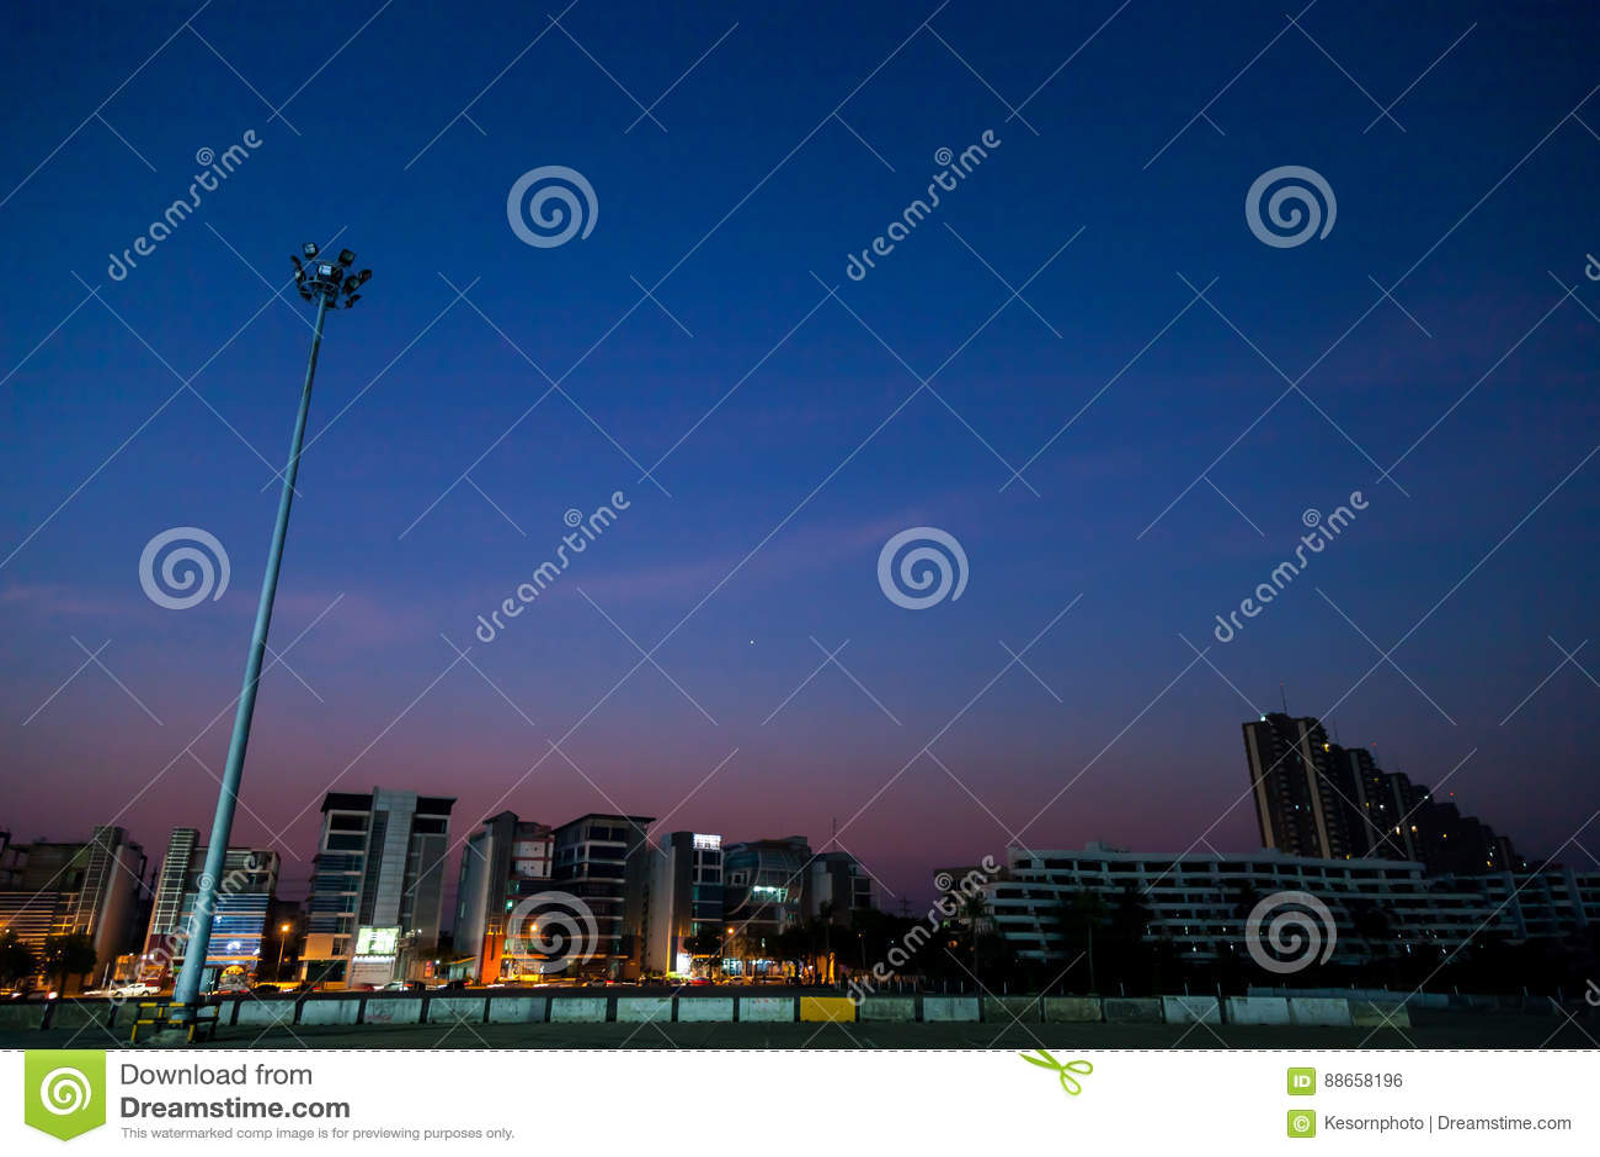 City on night time